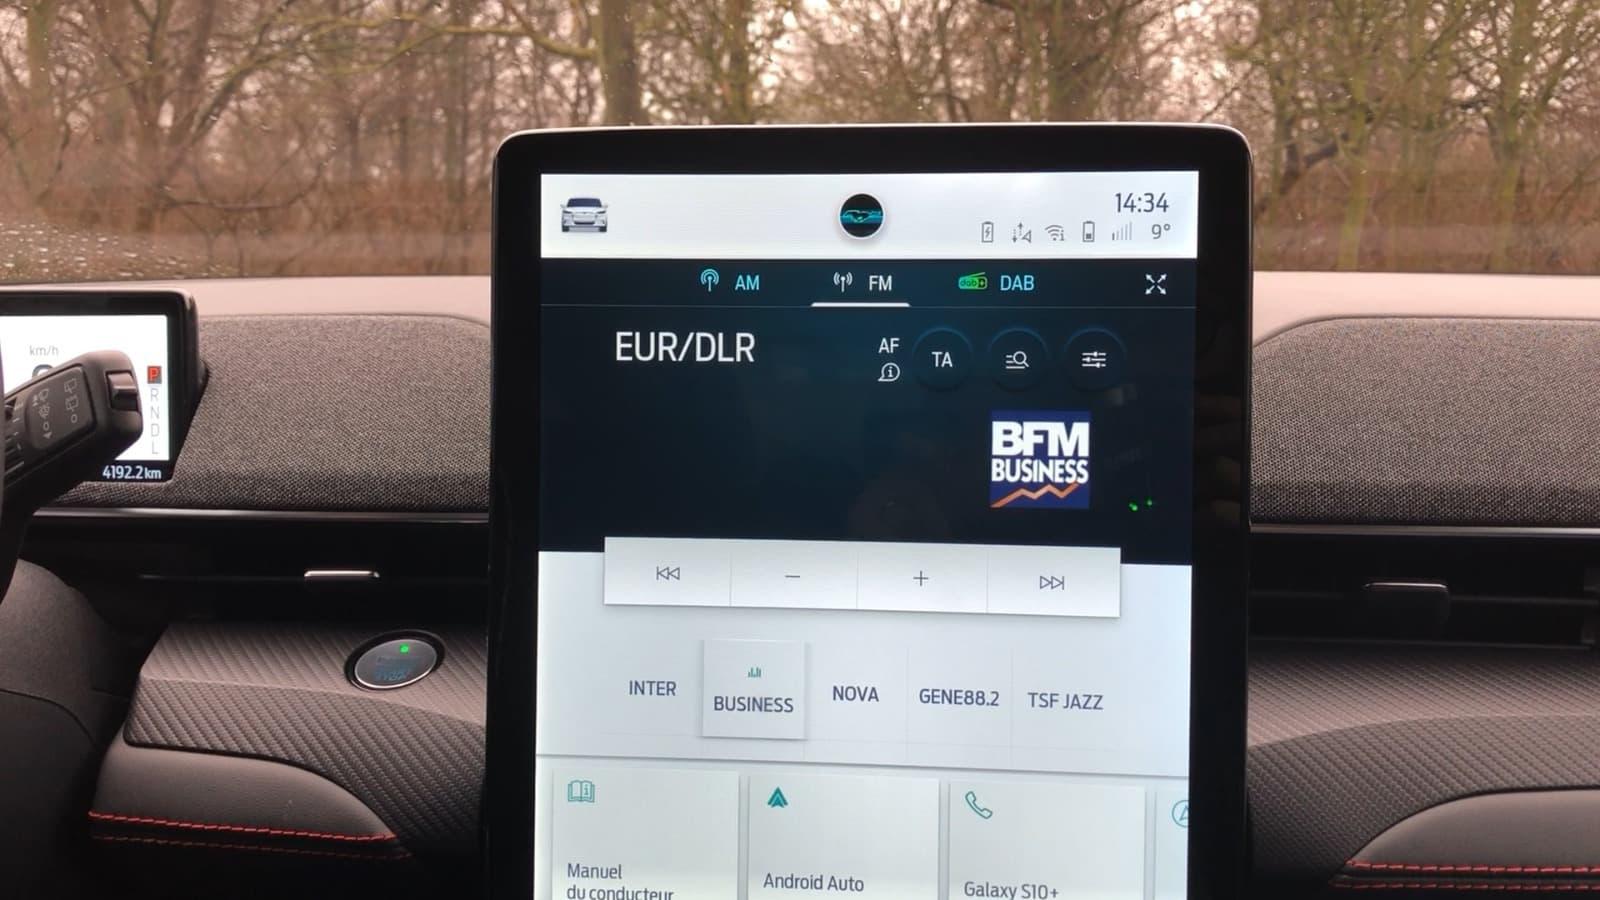 Digicode, écran vertical, application... la Mustang Mach-E propulse Ford dans le futur